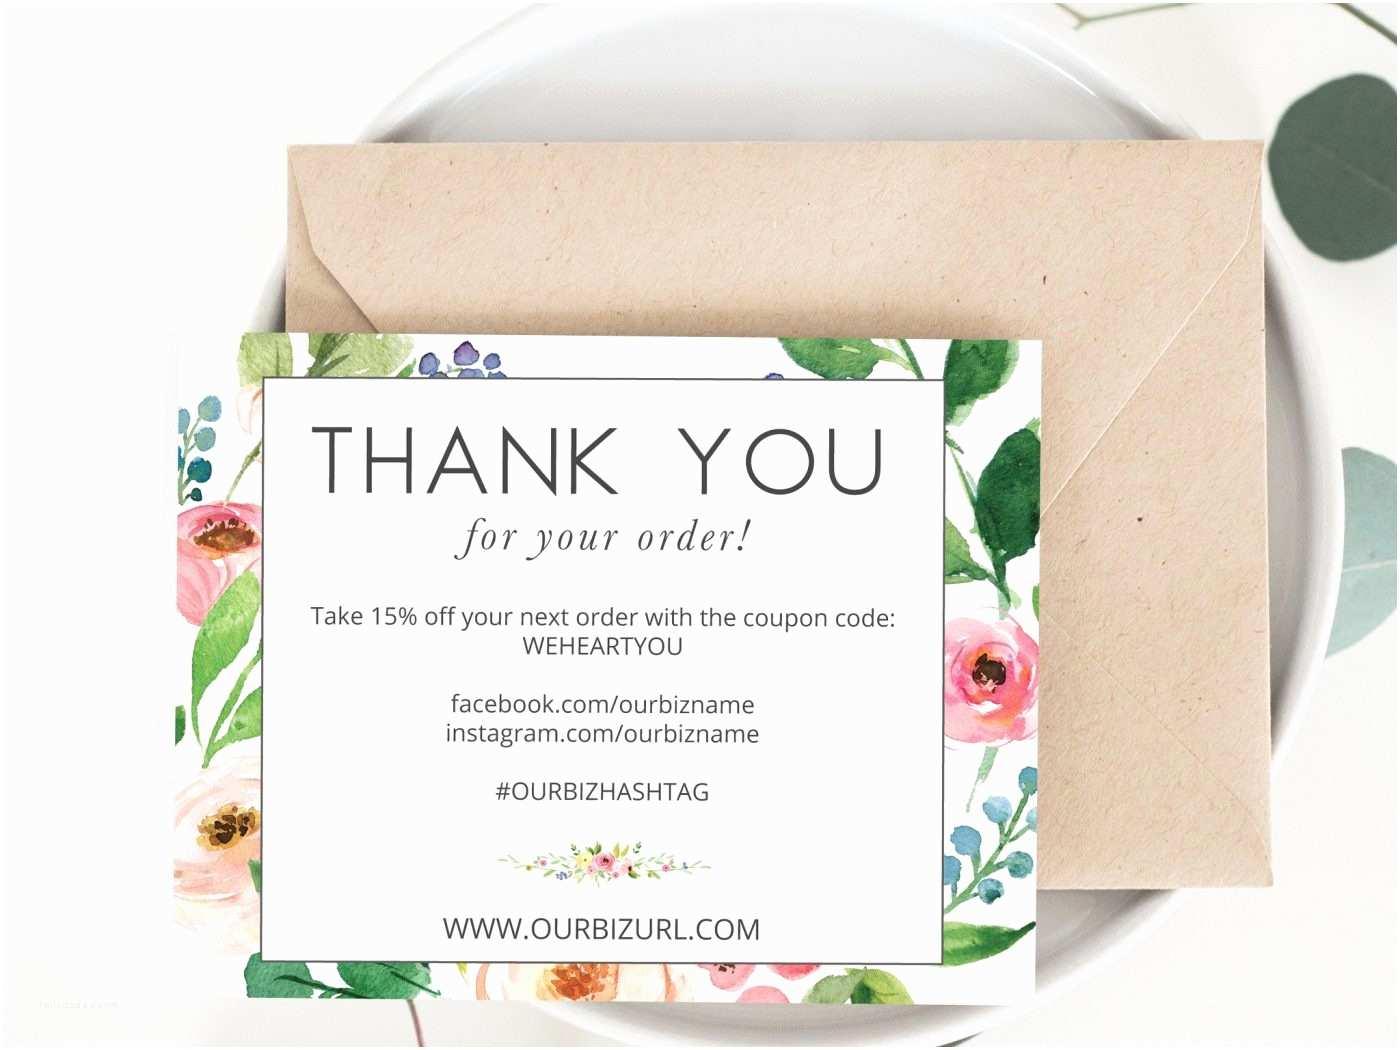 Fedex Wedding Invitations Make Business Cards at Fedex Fice Gallery Card Design